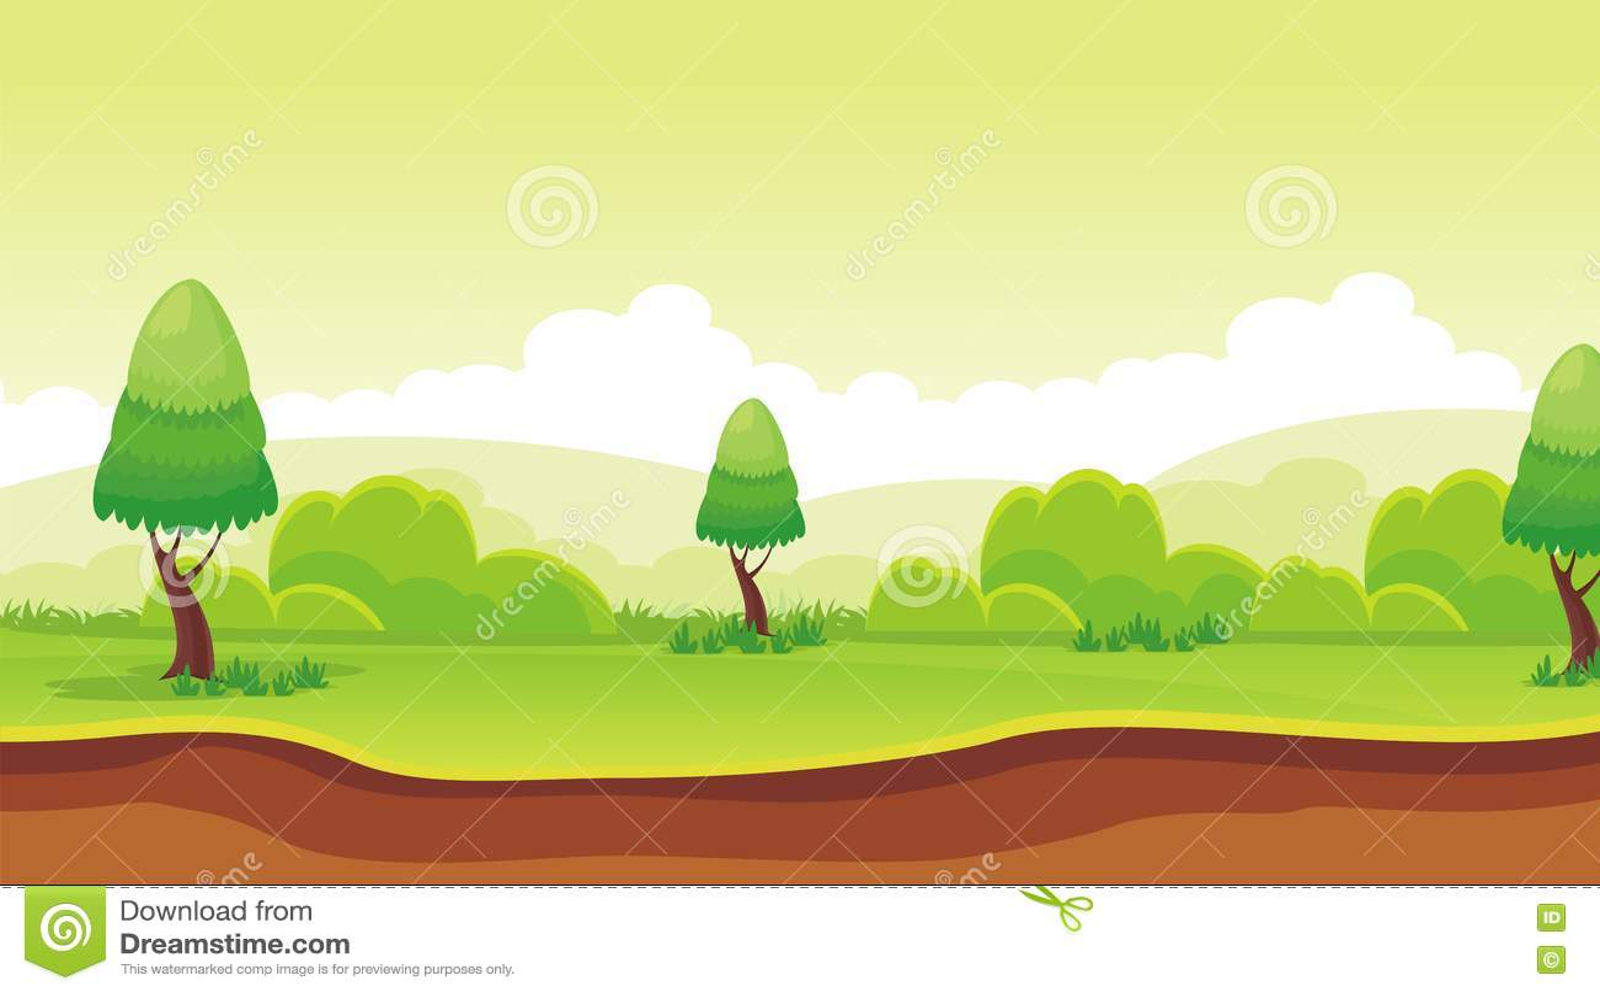 Flat Cartoon Nature Scenery Landscape Vector Illustration Layered Ground Grass Trees Stock Vector Illustration Of Animation Environment 76618326